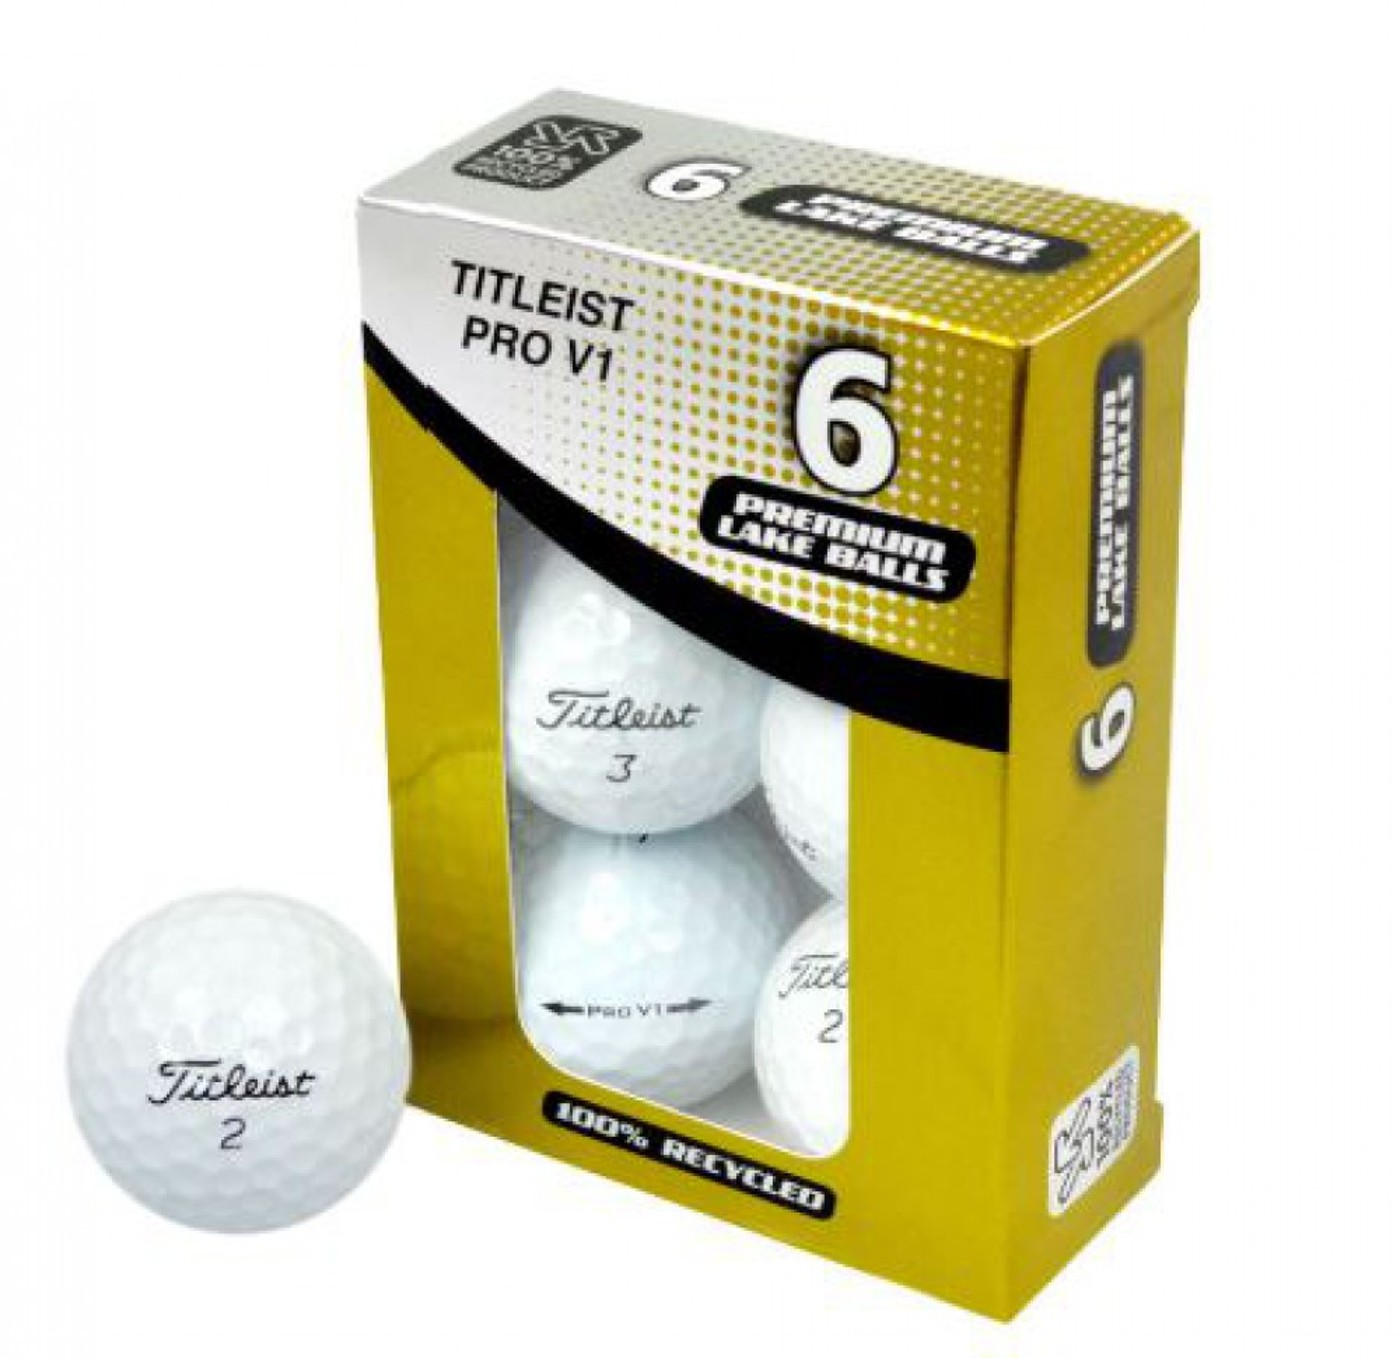 Titleist Golf Balls PROV1 / X